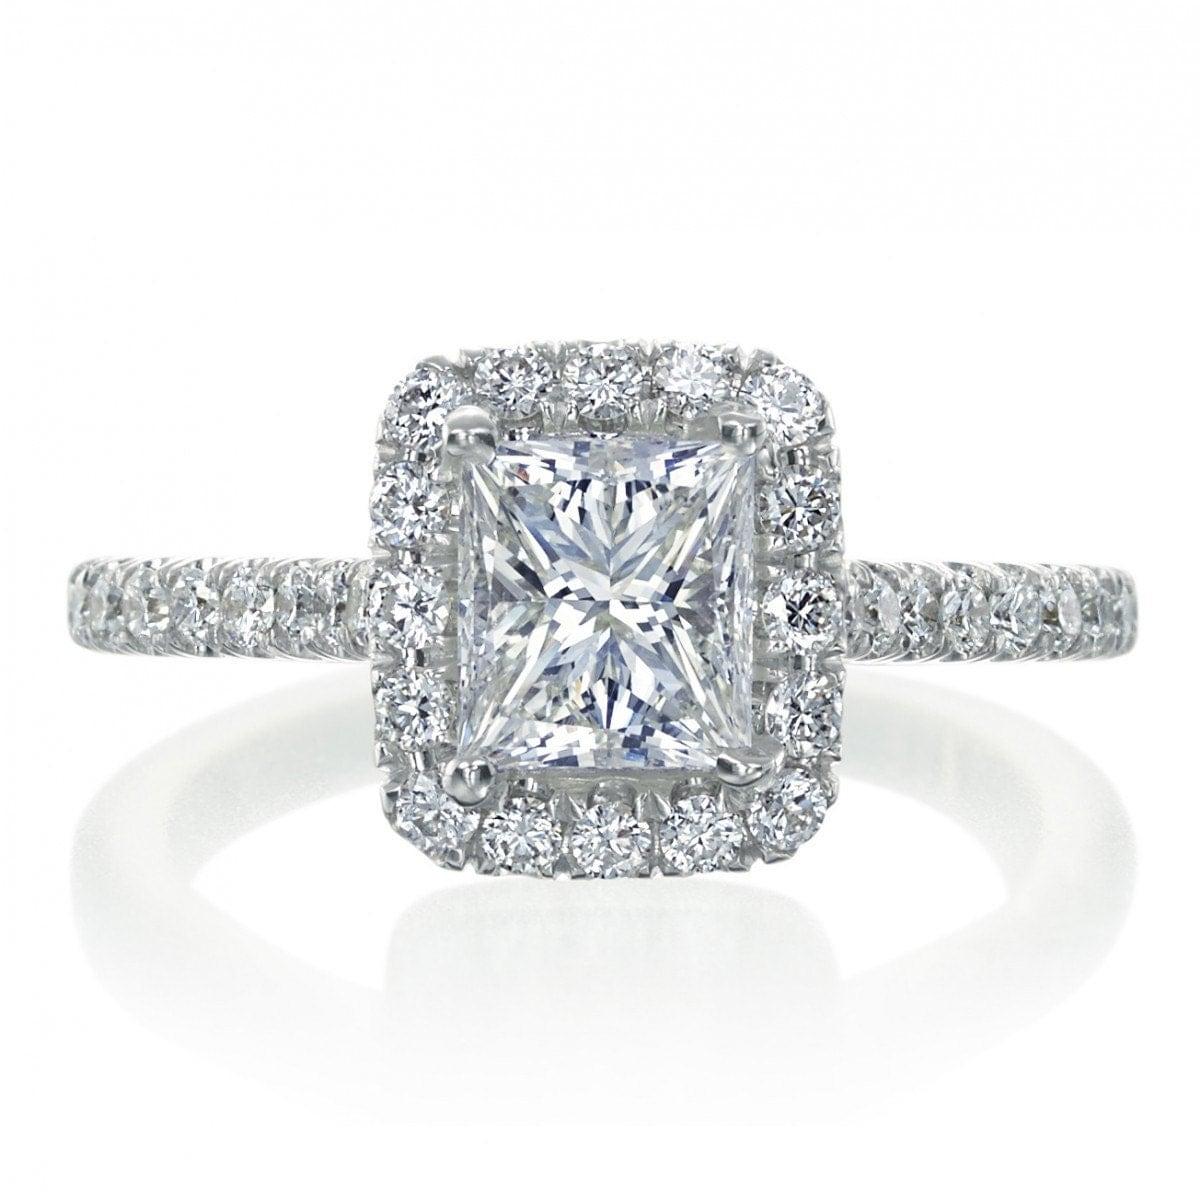 2 00 Carat Princess Cut Halo Diamond Engagement by MazelandBroche